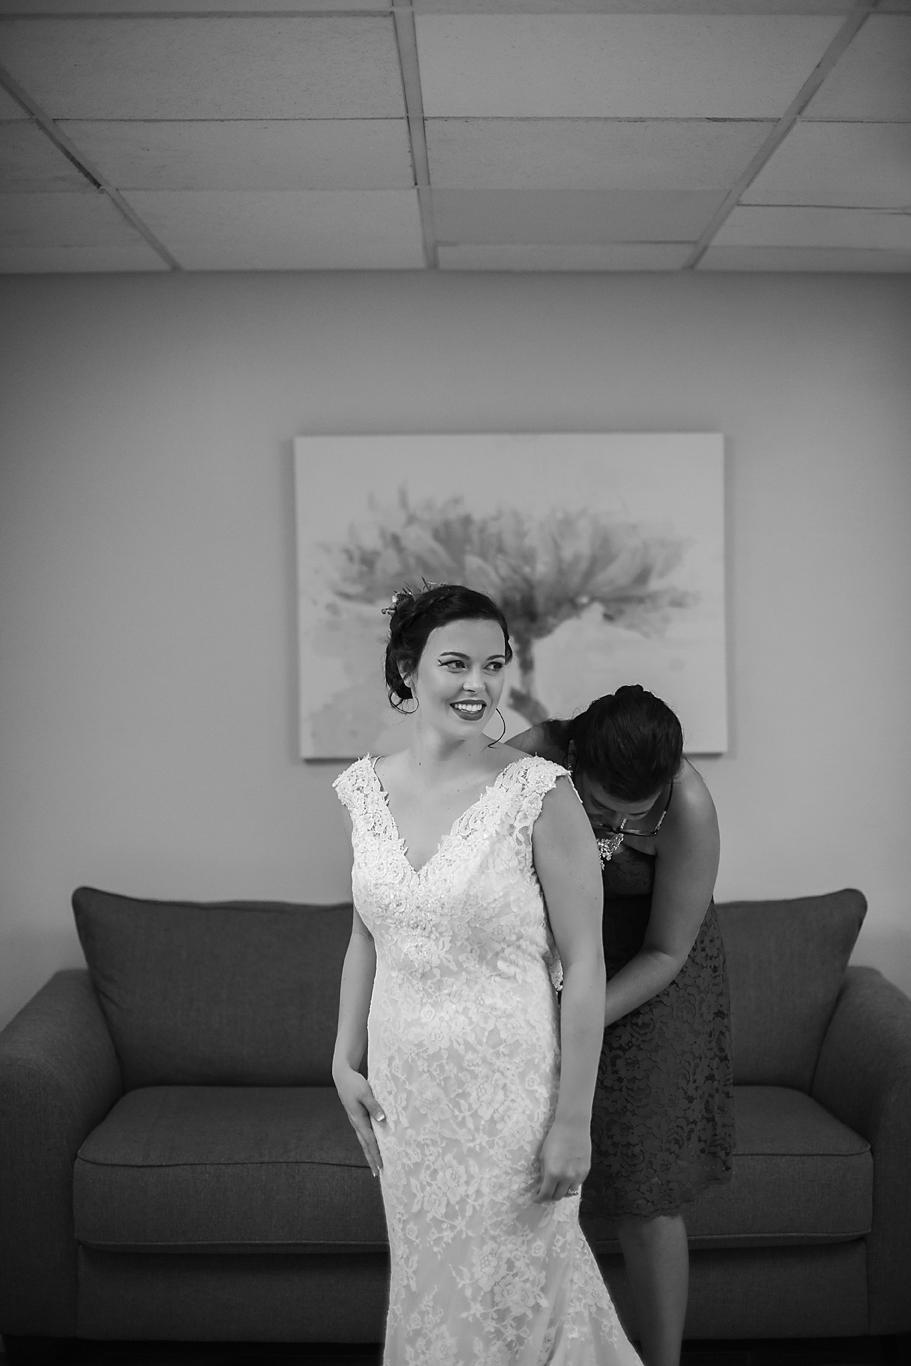 Kayla + Jesse - Tampa Wedding Photography - East Lake Woodland's Country Club Wedding Photographer - Emily & Co. Photography  (11).jpg